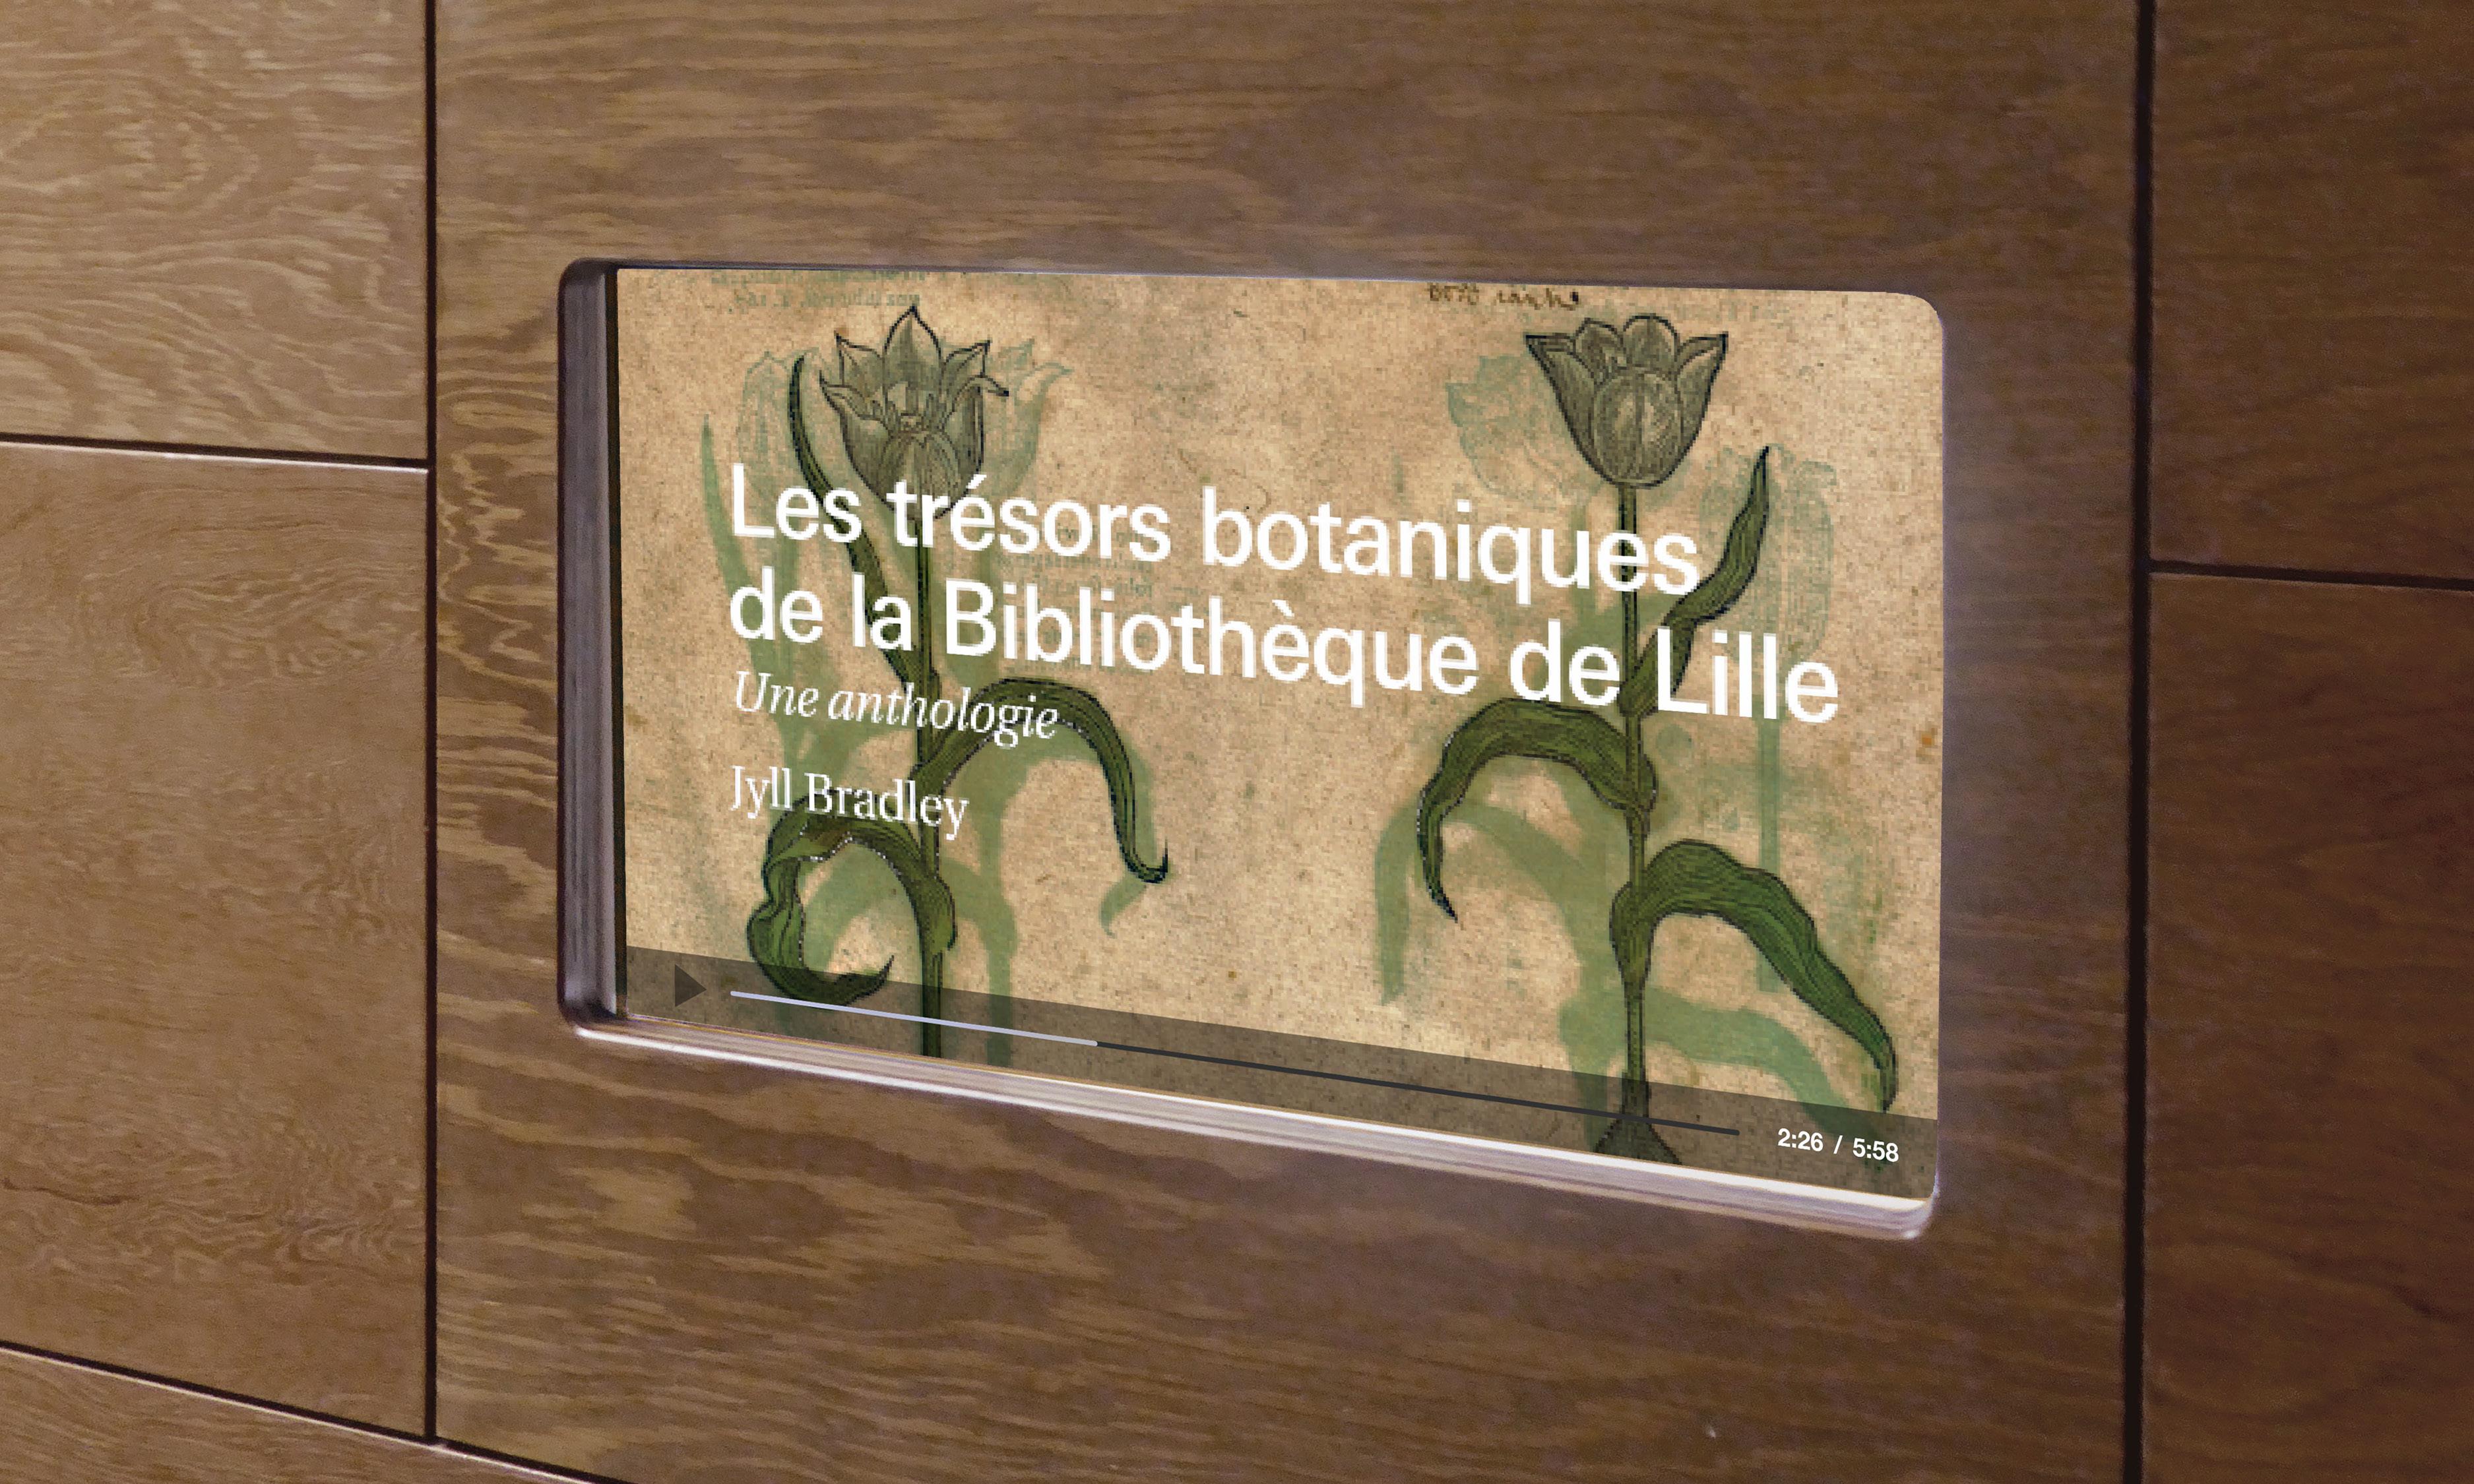 Le-jardin-hosp-slideshow-LR1.jpg